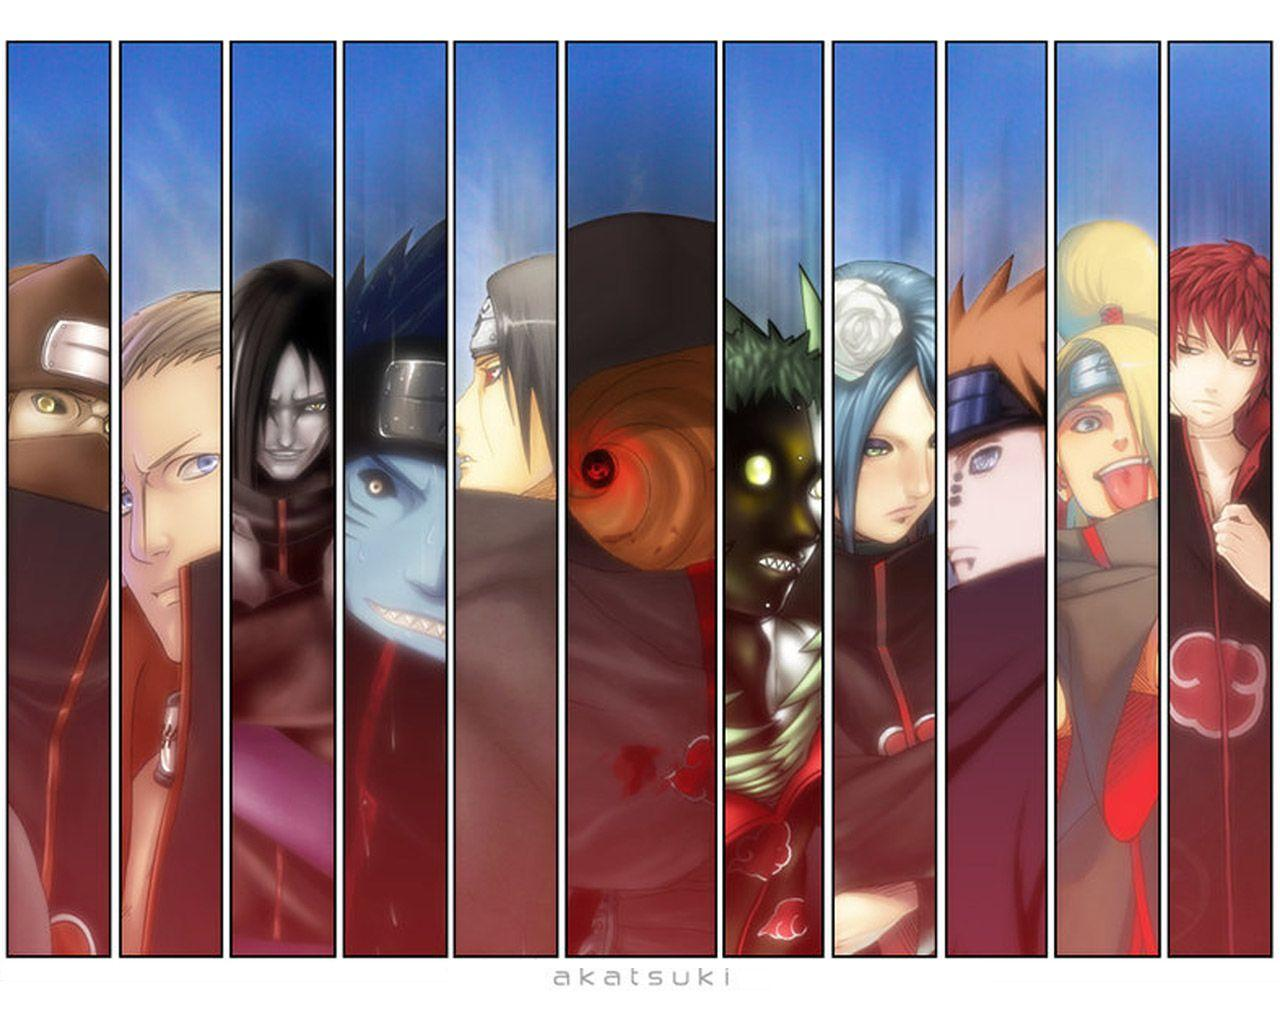 Naruto Shippuden Akatsuki 1027 Hd Wallpapers in Cartoons ...